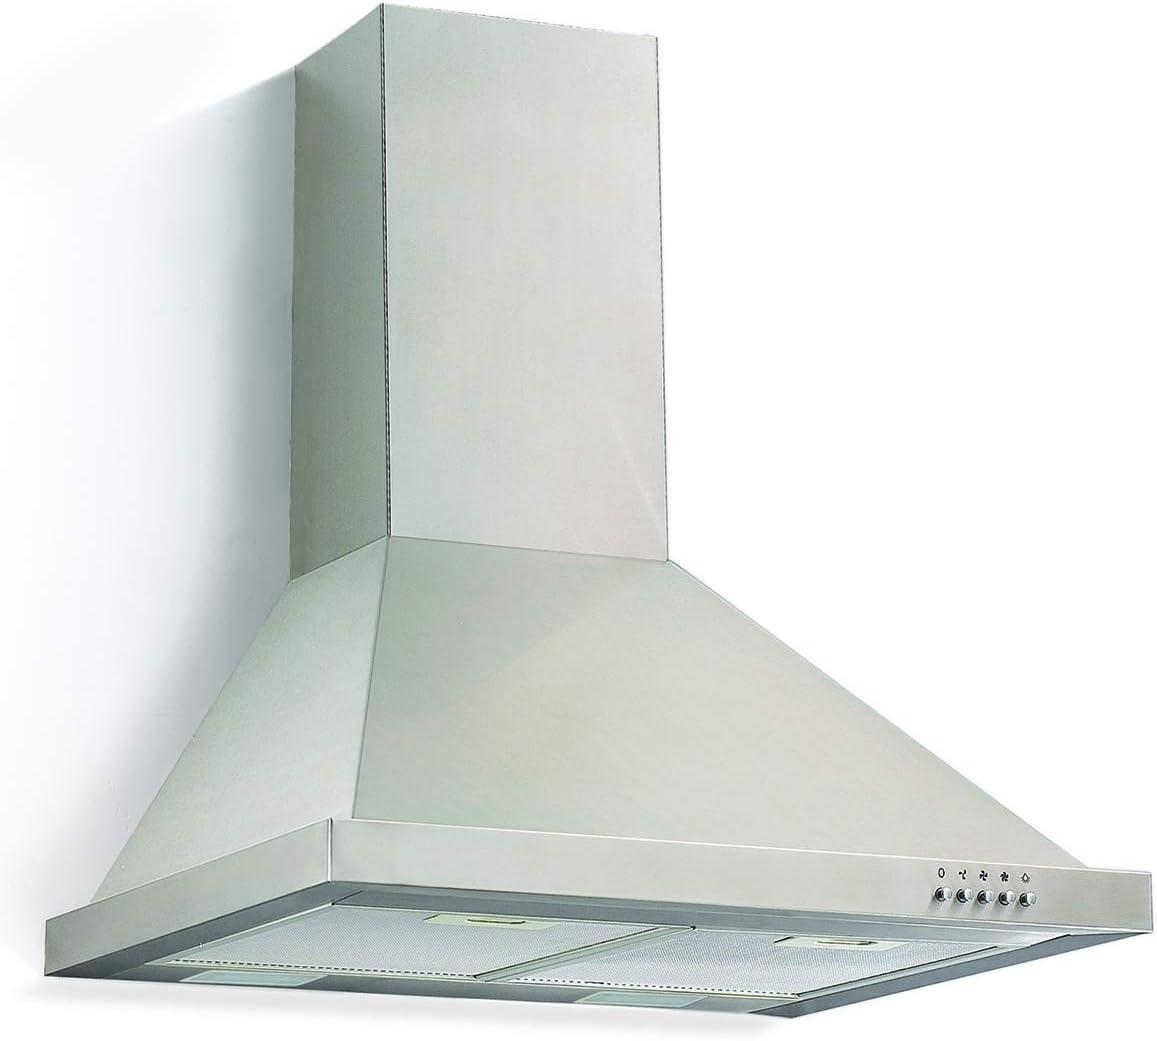 3 niveles de potencia Orbegozo DS 48170 B IN extracci/ón 632,3 m3//h Campana extractora decorativa 70 cm iluminaci/ón LED acero inoxidable